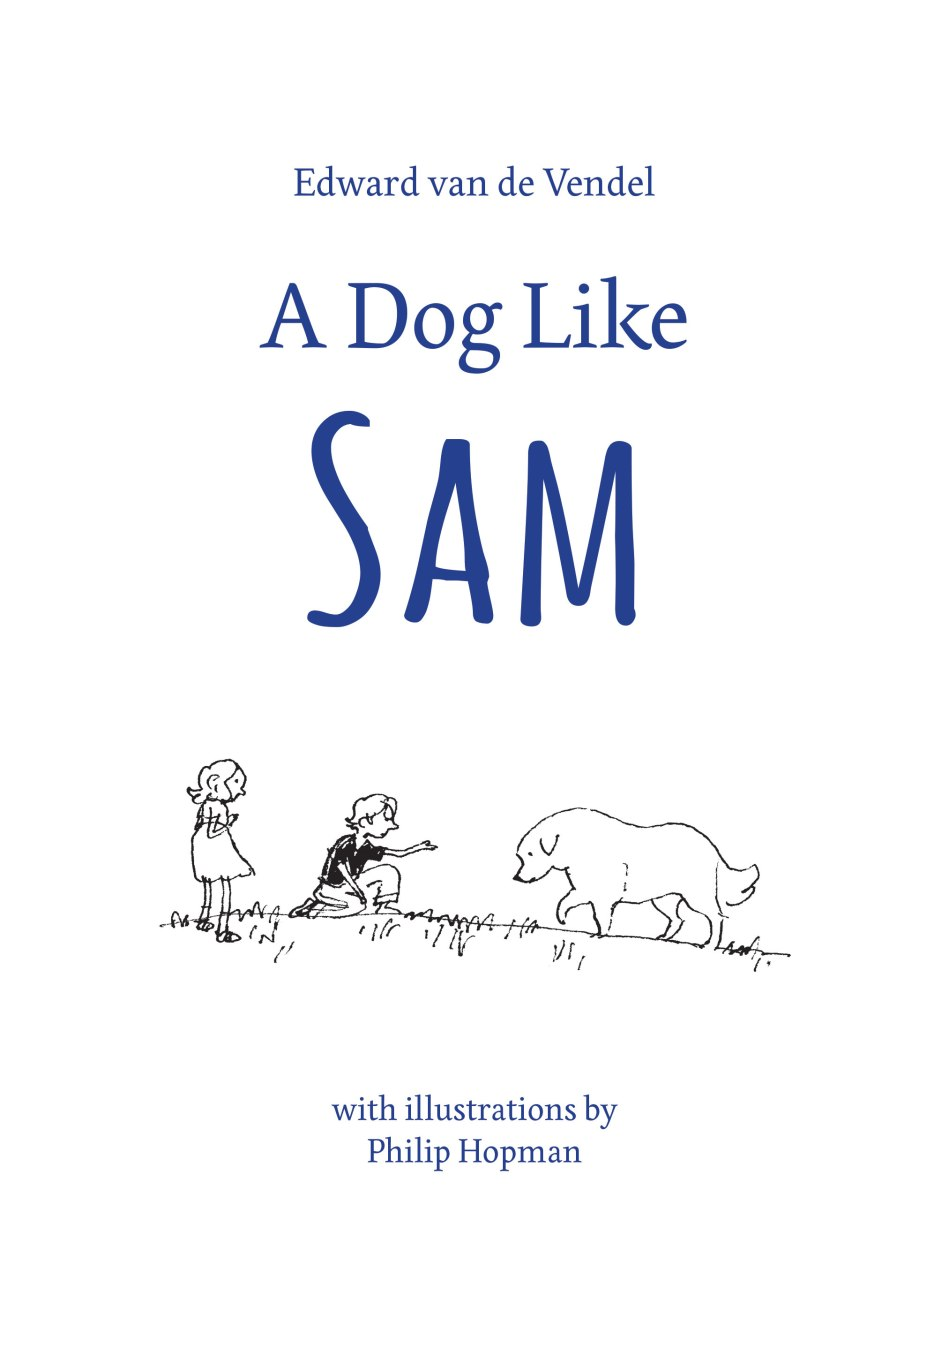 A Dog Like Sam Edward Van de Vendel